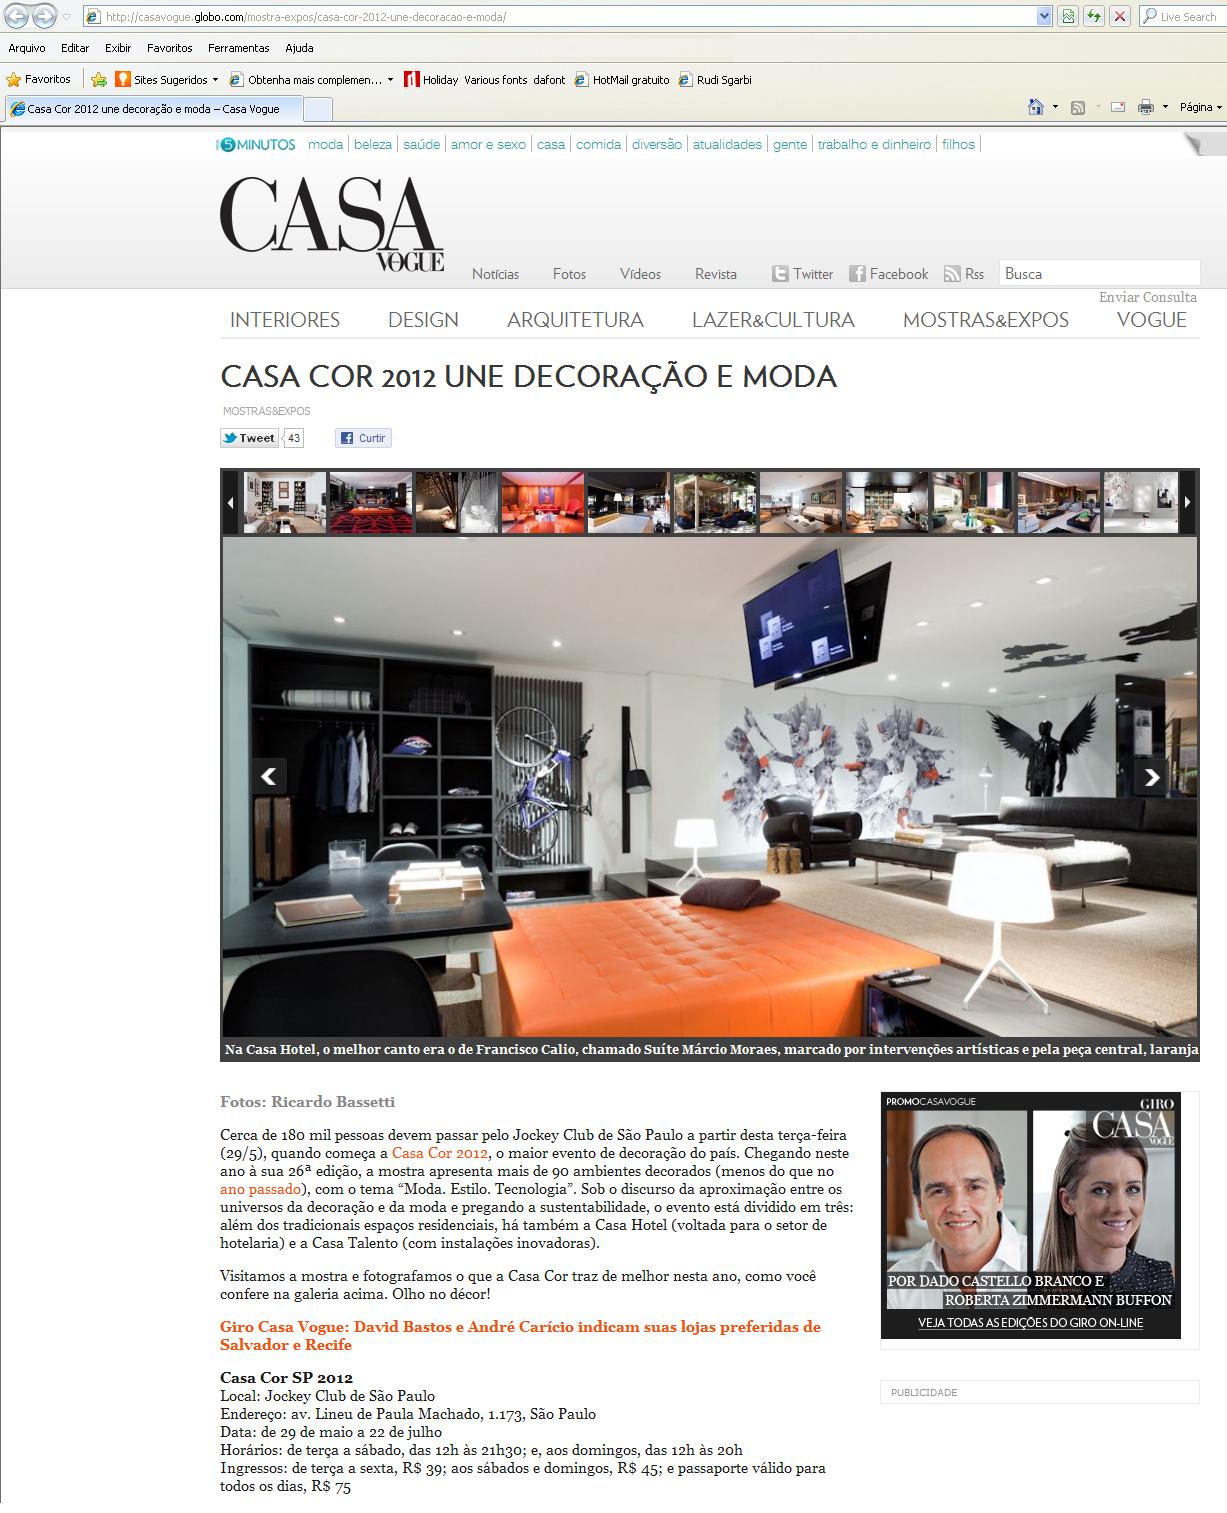 CCSP2012_Calio_CasaVogue